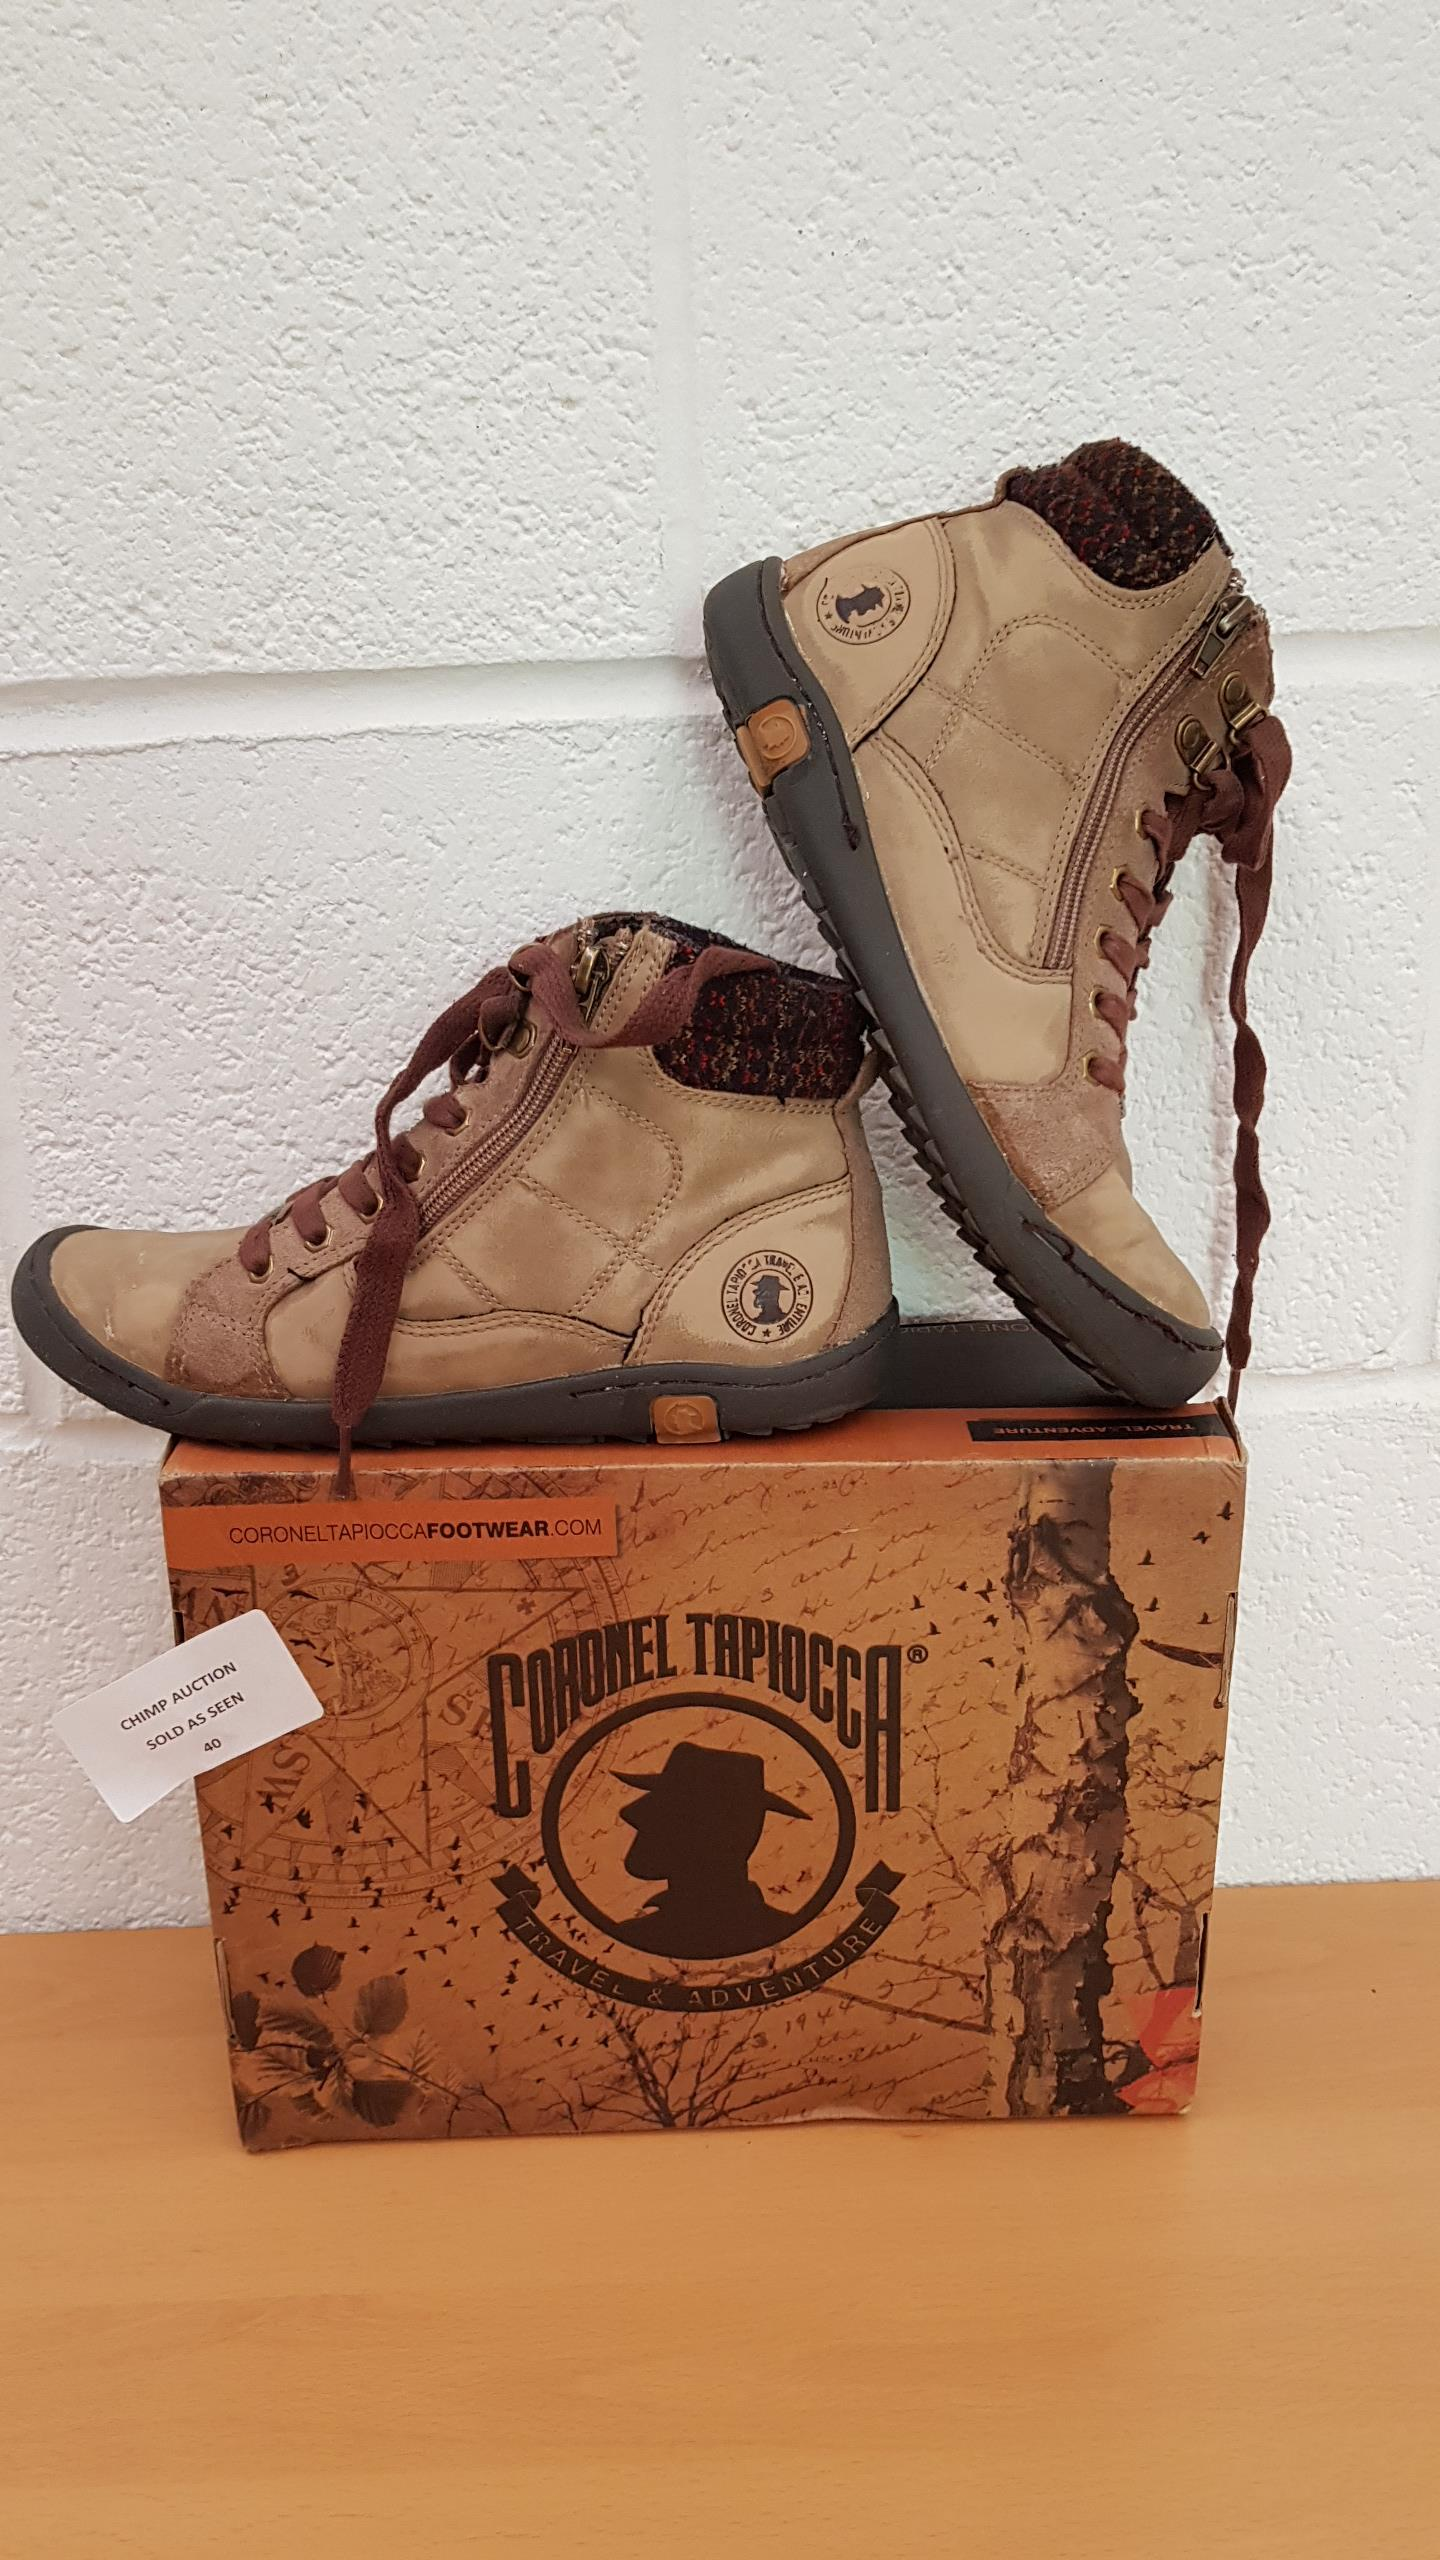 Lot 40 - Coronel Tapiocca shoes EU SIZE 38